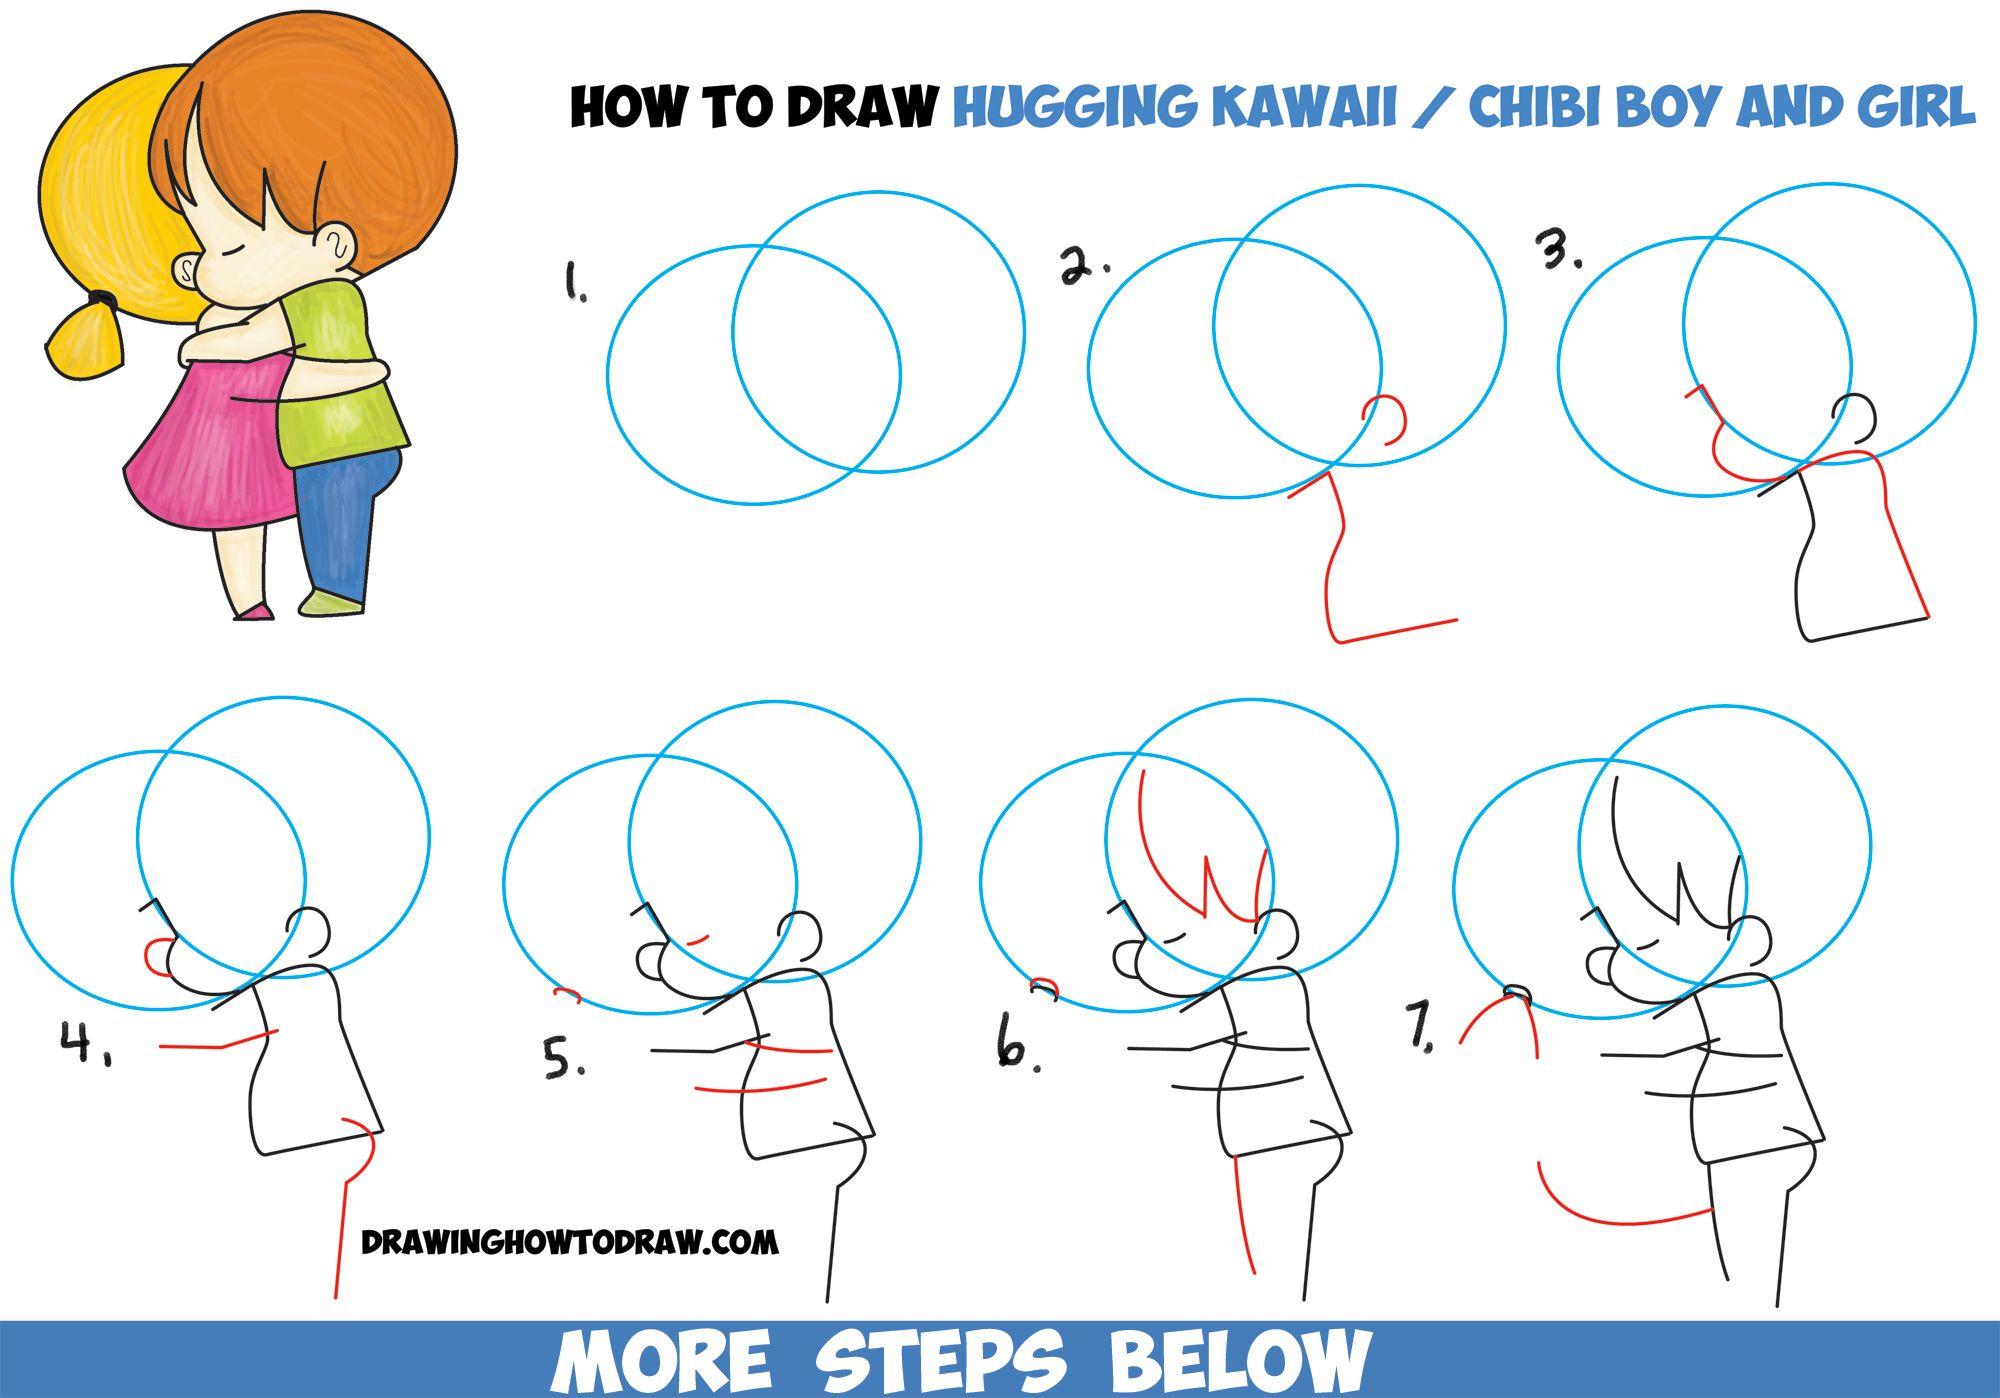 How to Draw Chibi Girl and Boy Hugging Cute Kawaii